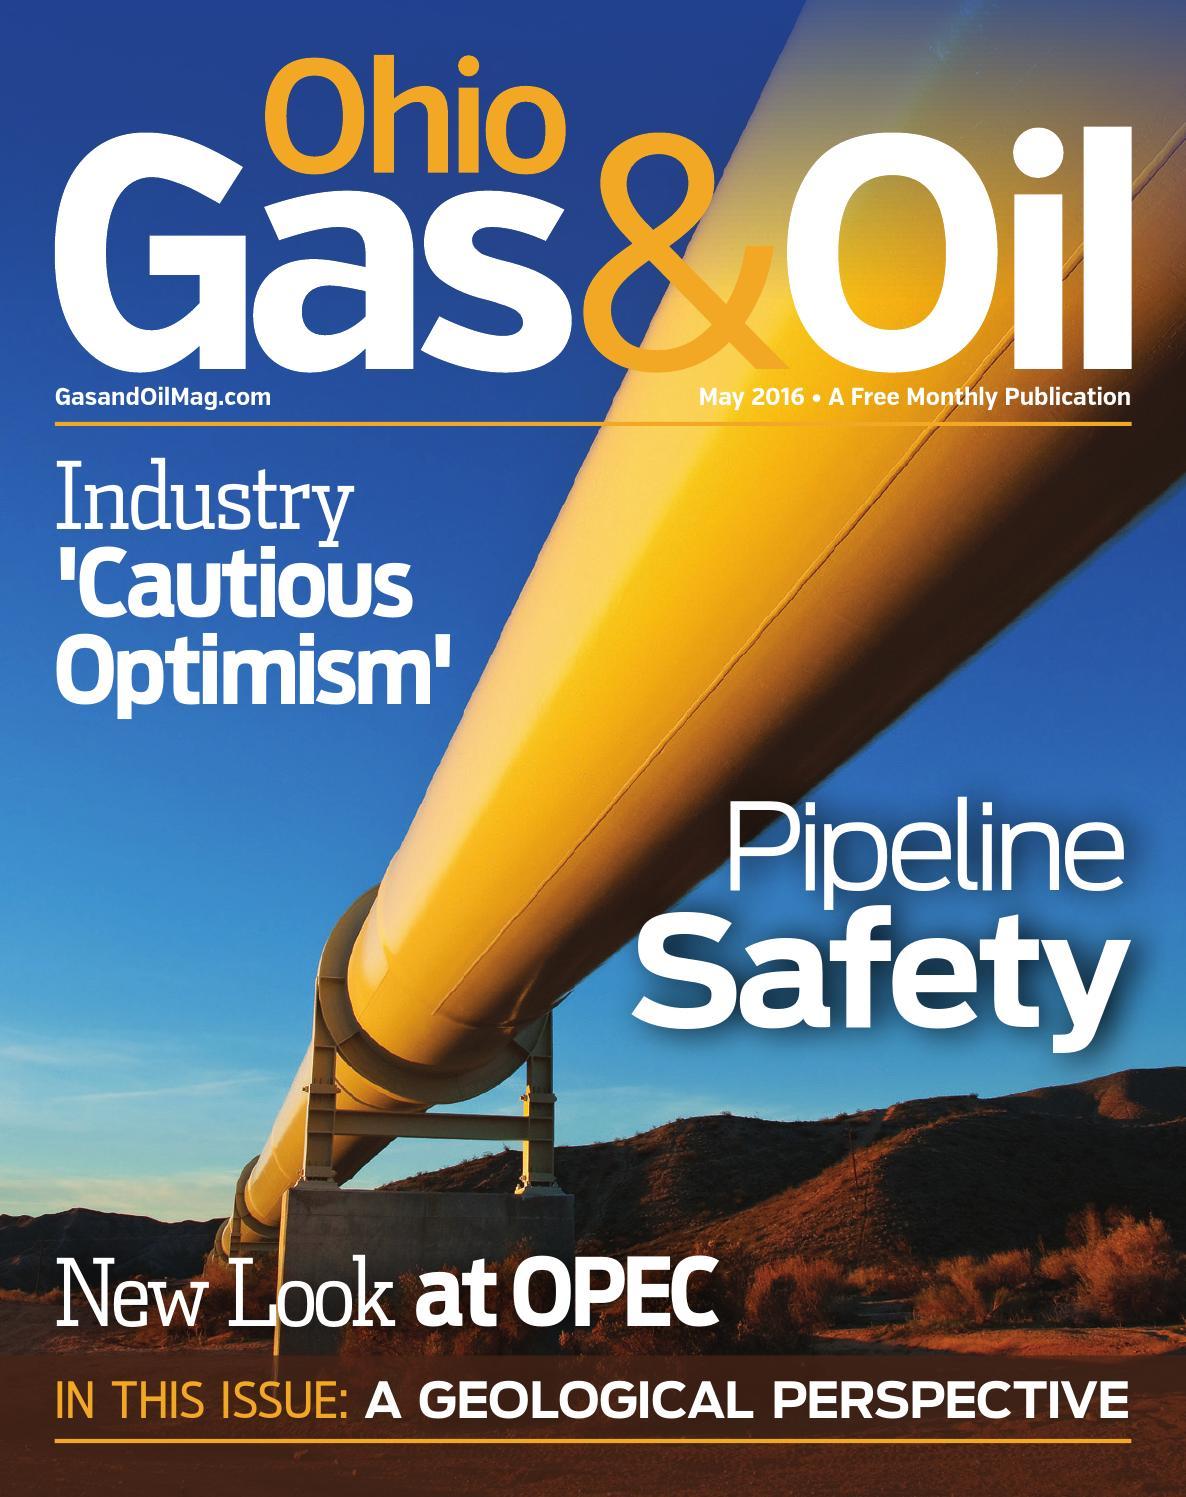 Ohio Gas u0026 Oil May 2016 by GateHouse Media NEO - issuu